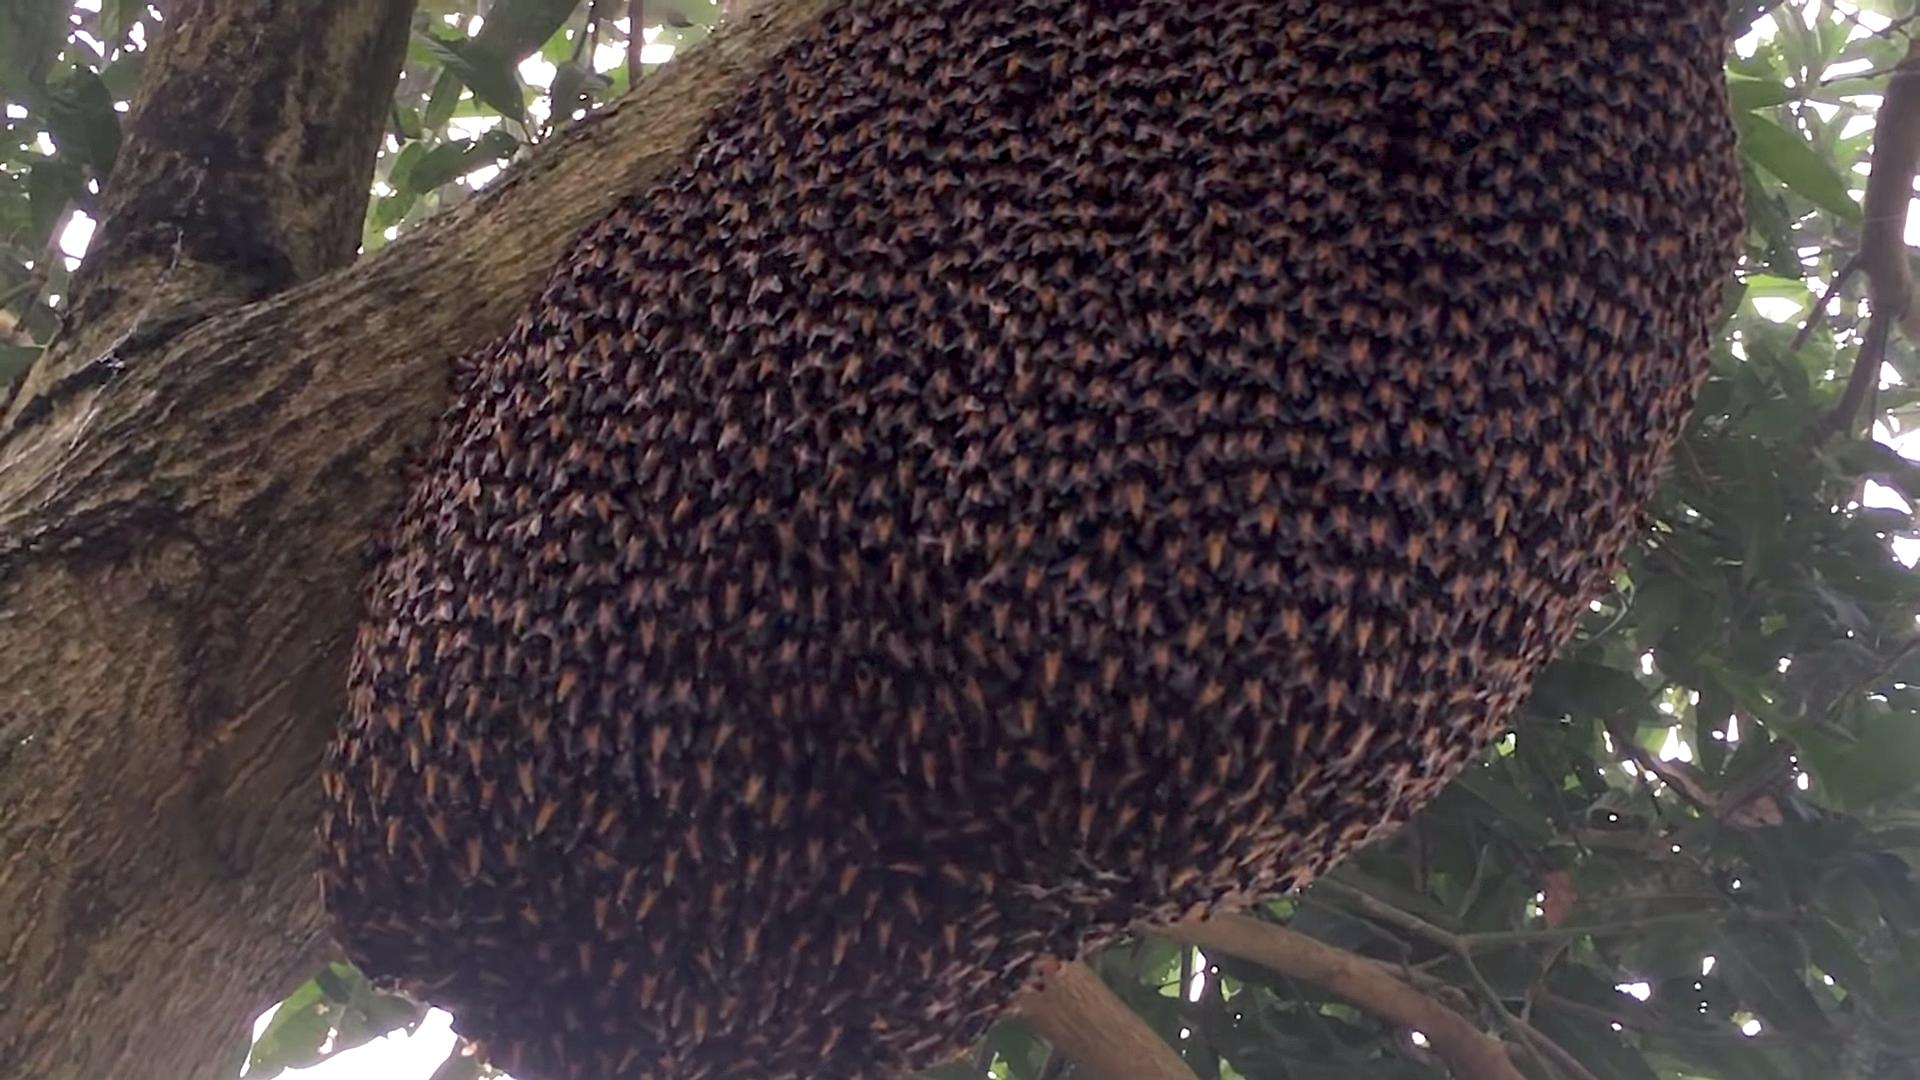 Defensive Waves Ripple Through Honey Bee Colony